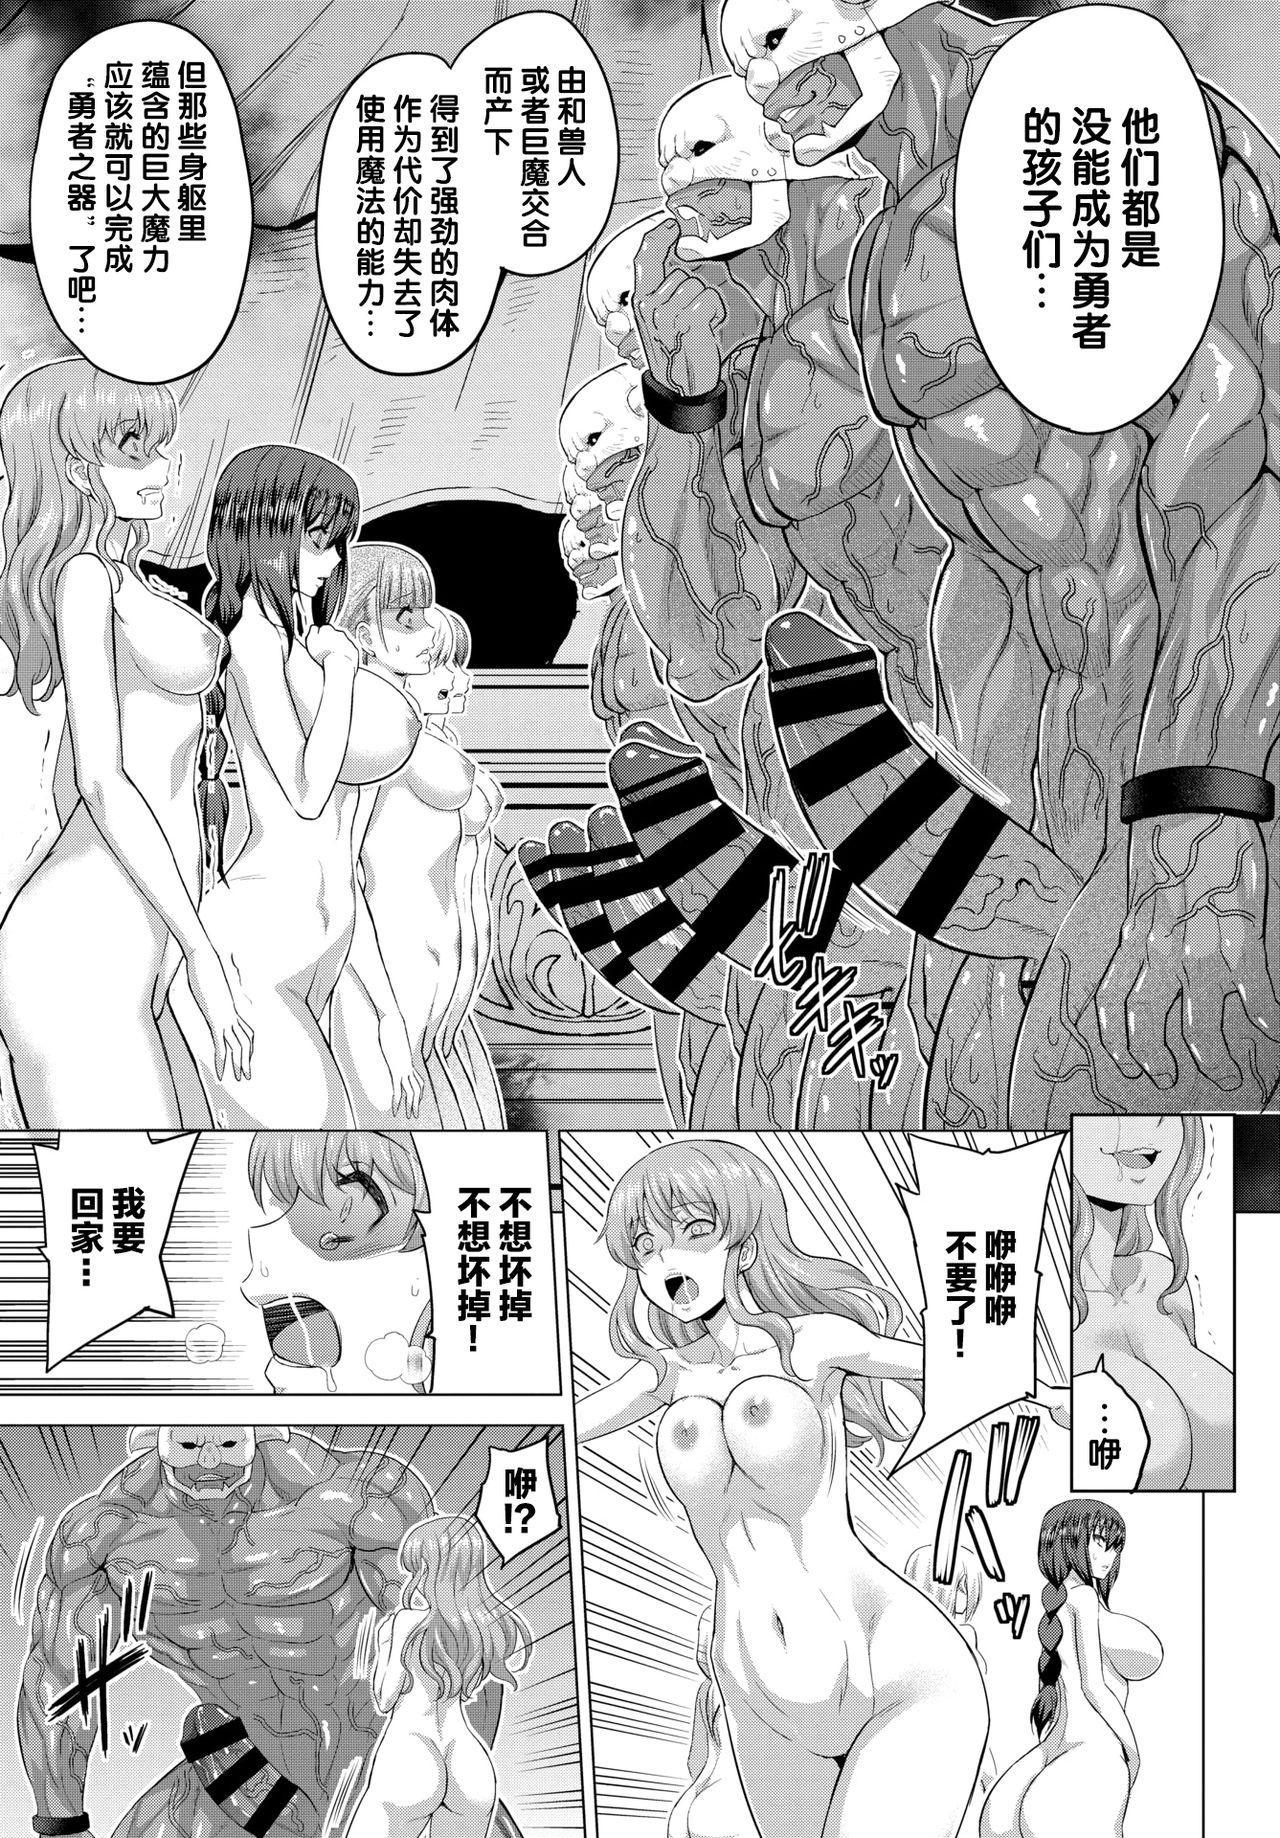 [Yamada Gogogo] Seijo no Rakuin -Annunciation of despair- #05 (COMIC BAVEL 2021-03) [Chinese] [不够色汉化组] [Digital] 9